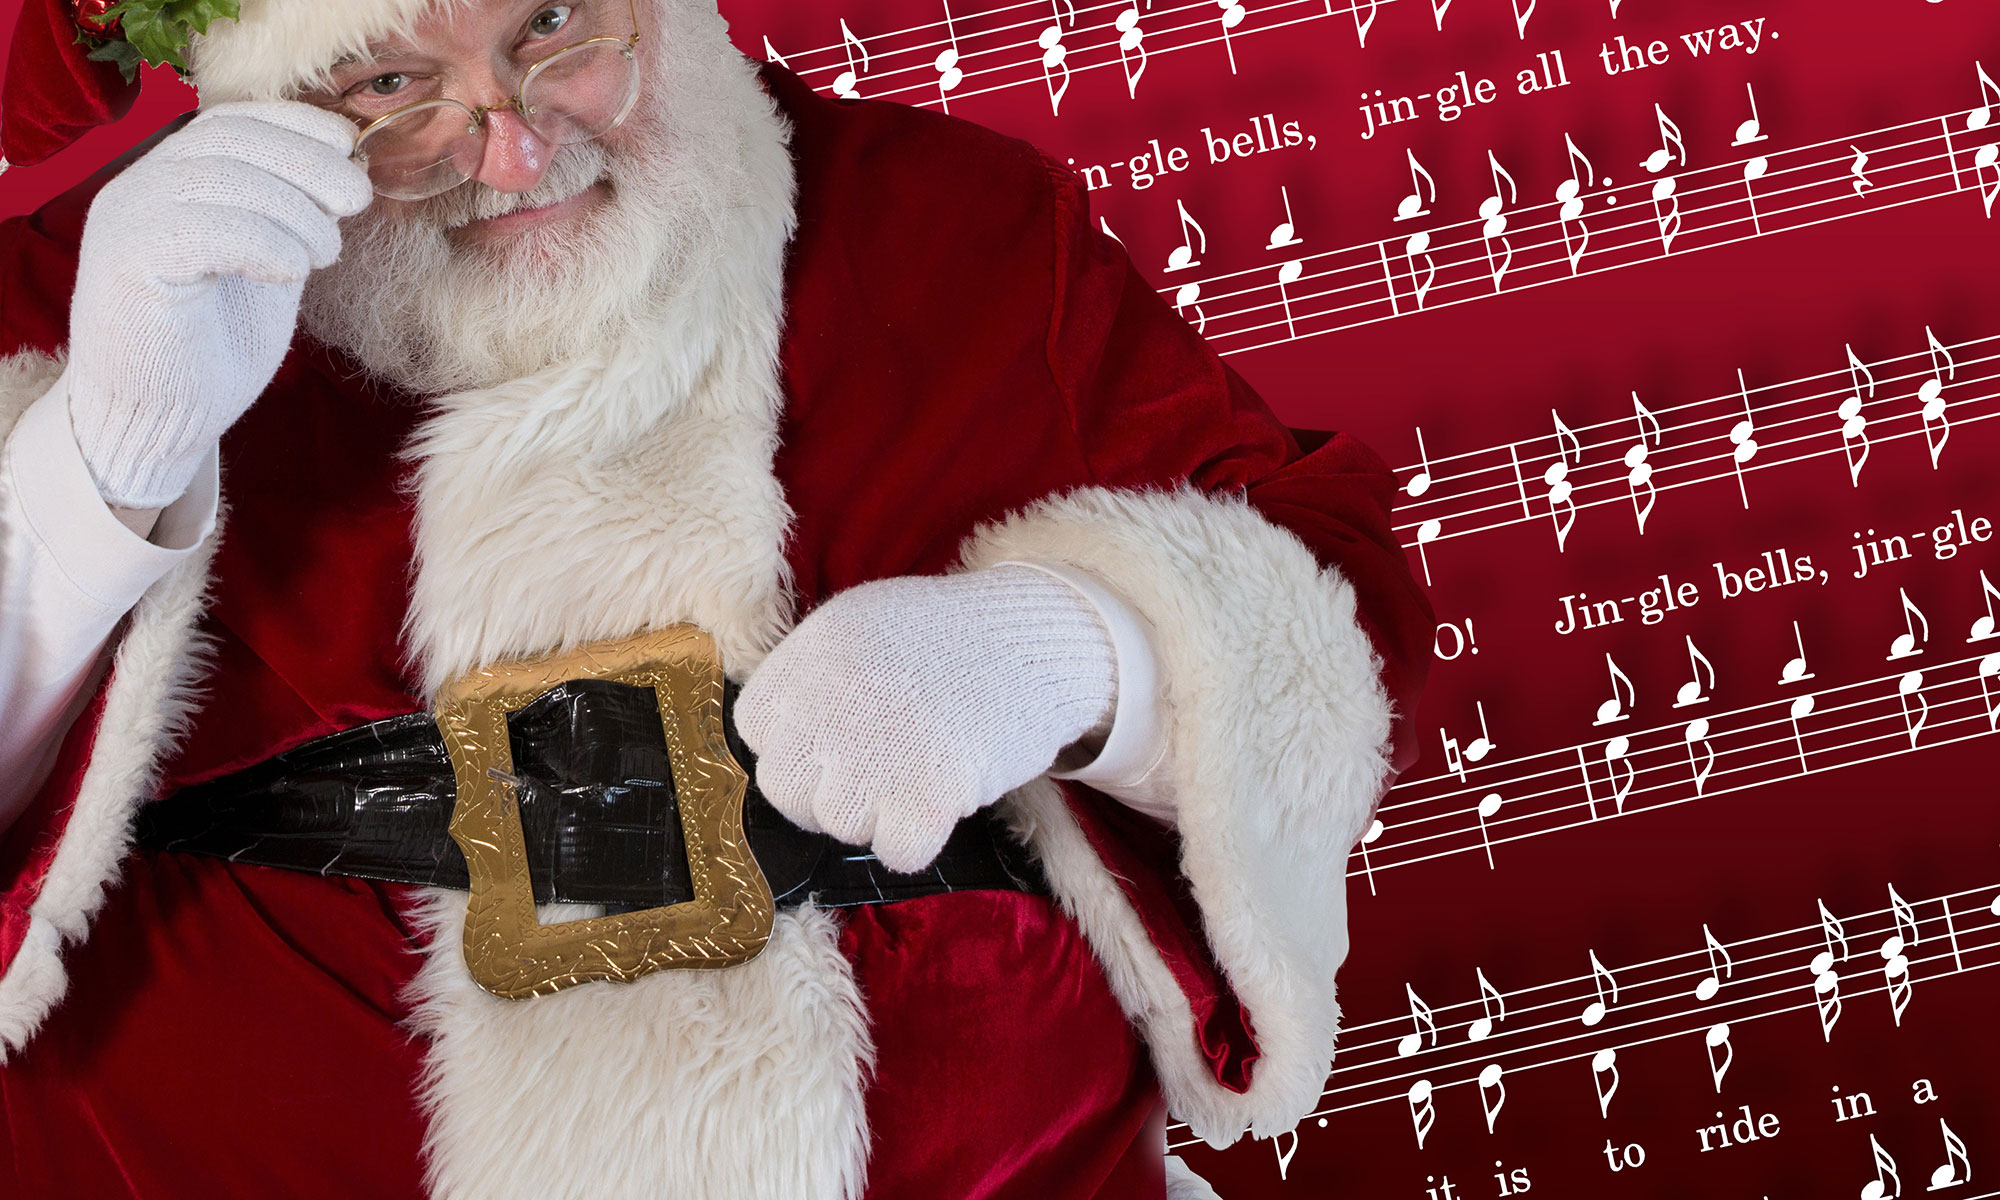 Santa Claus with Jingle Bells carol sheet music